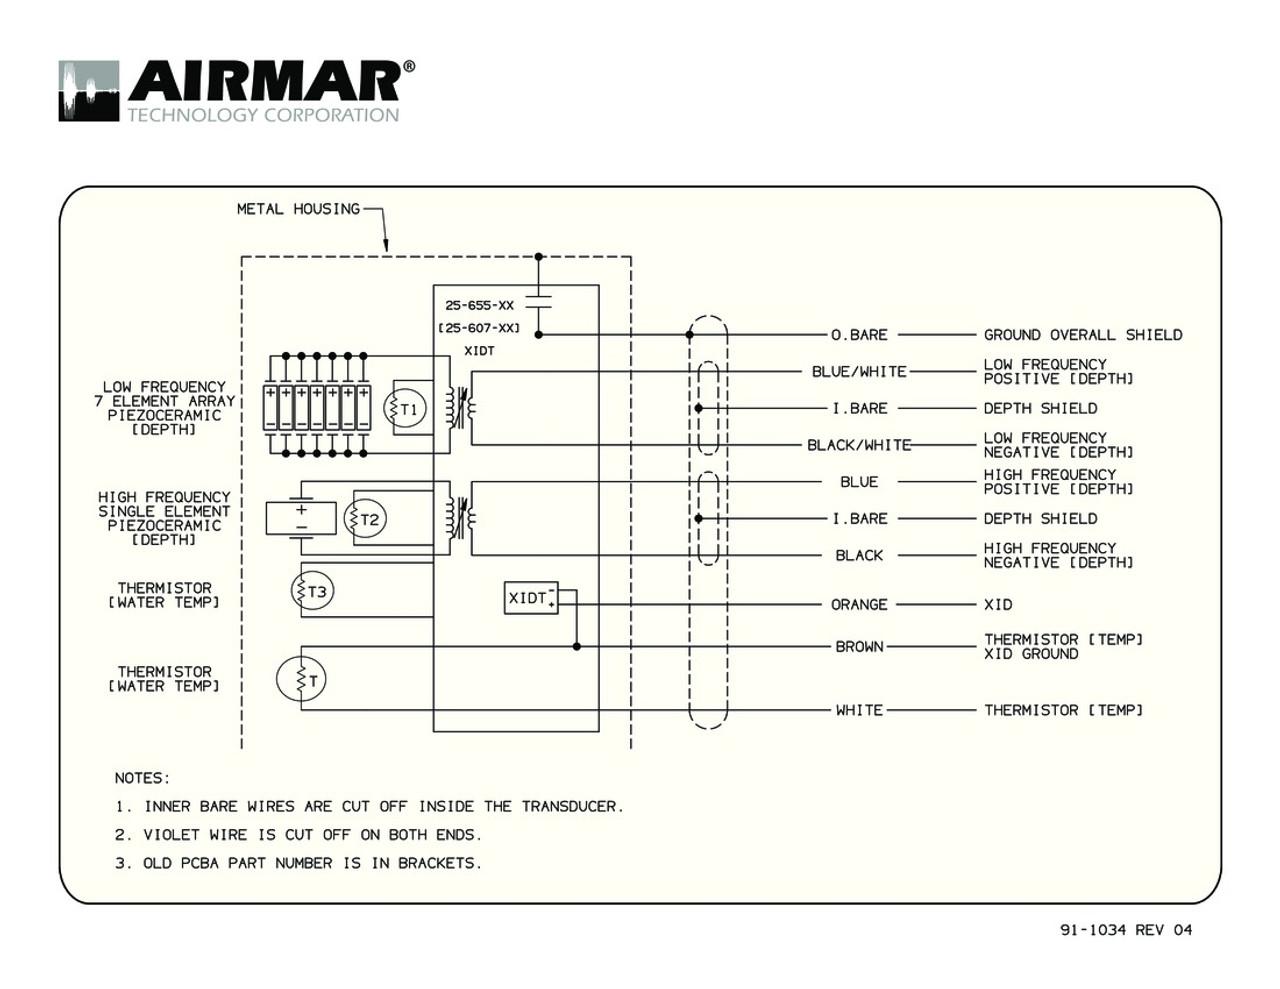 medium resolution of airmar wiring diagram b265 b275 blue bottle marine pressure transducer wiring diagram b265c lh